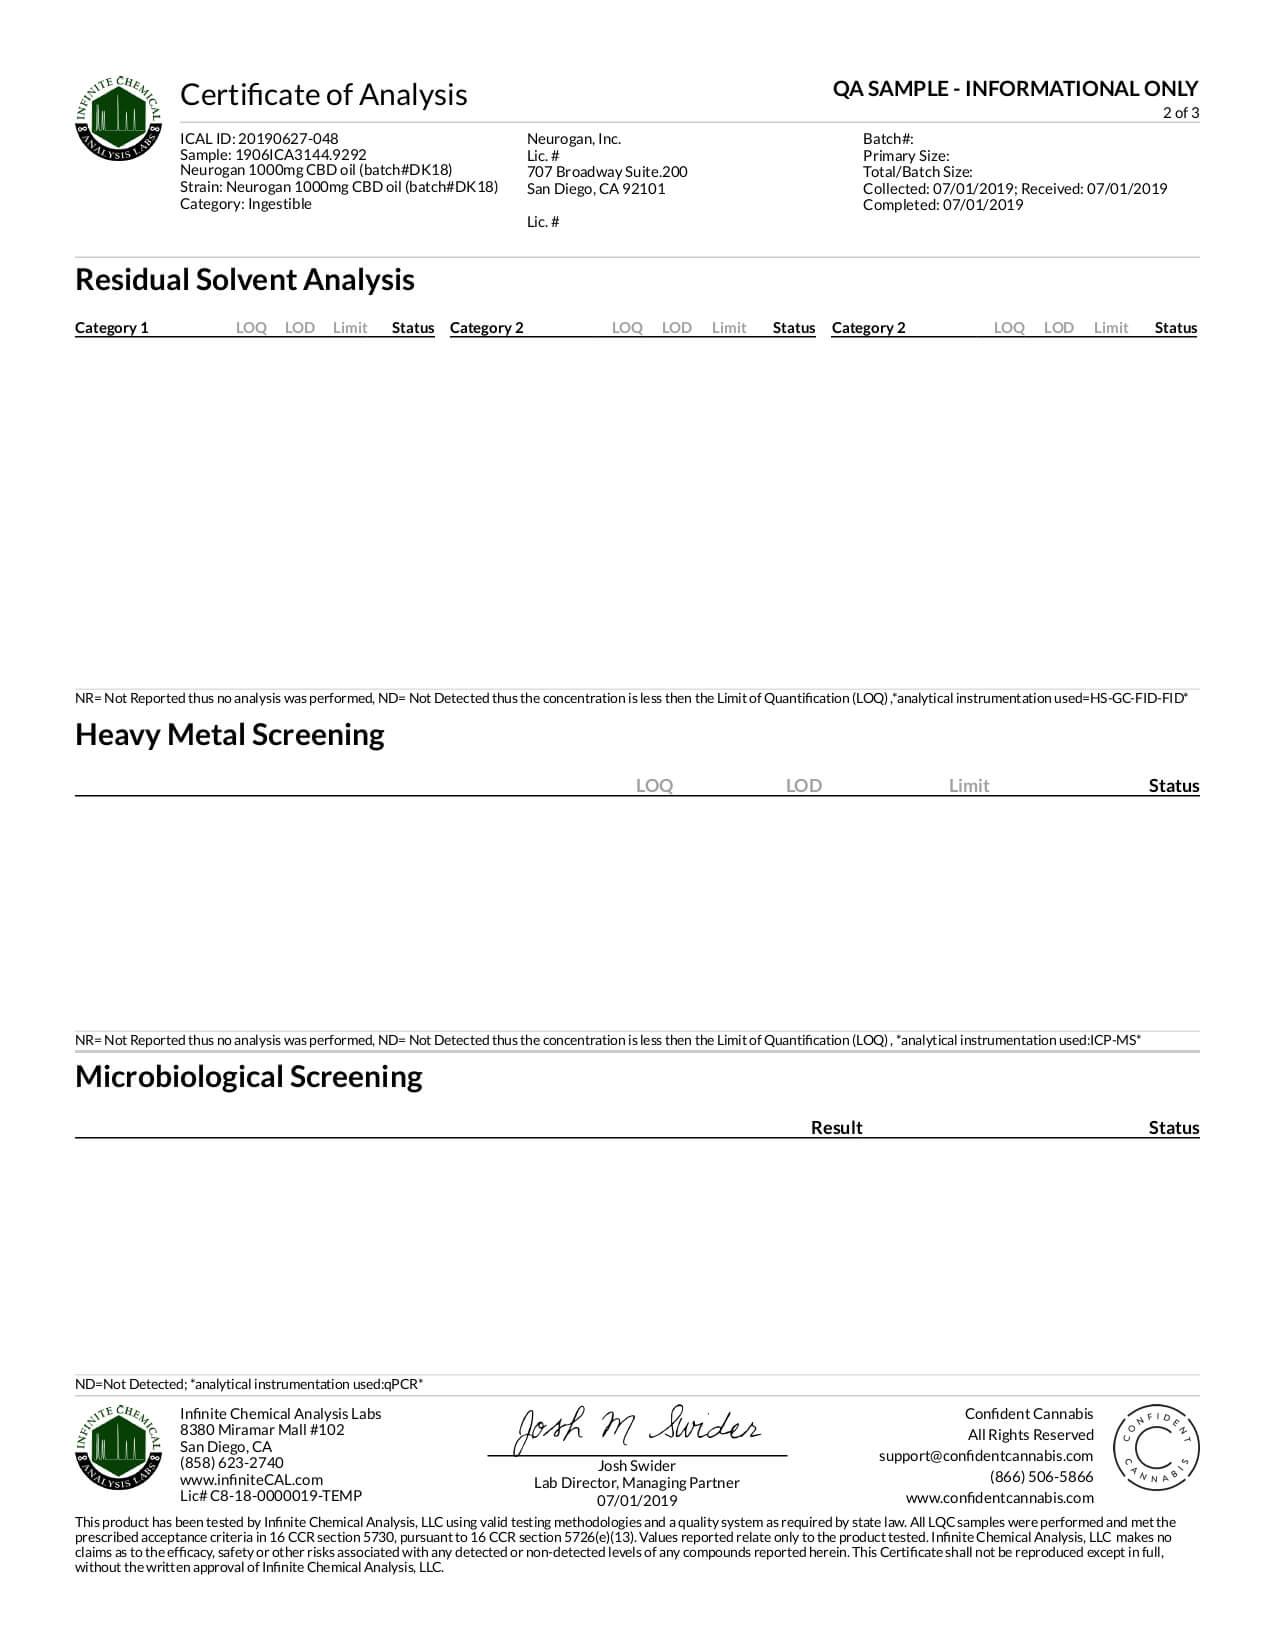 Neurogan, Inc. CBD Oil Spray Full Spectrum Citrus 1000mg Lab Report